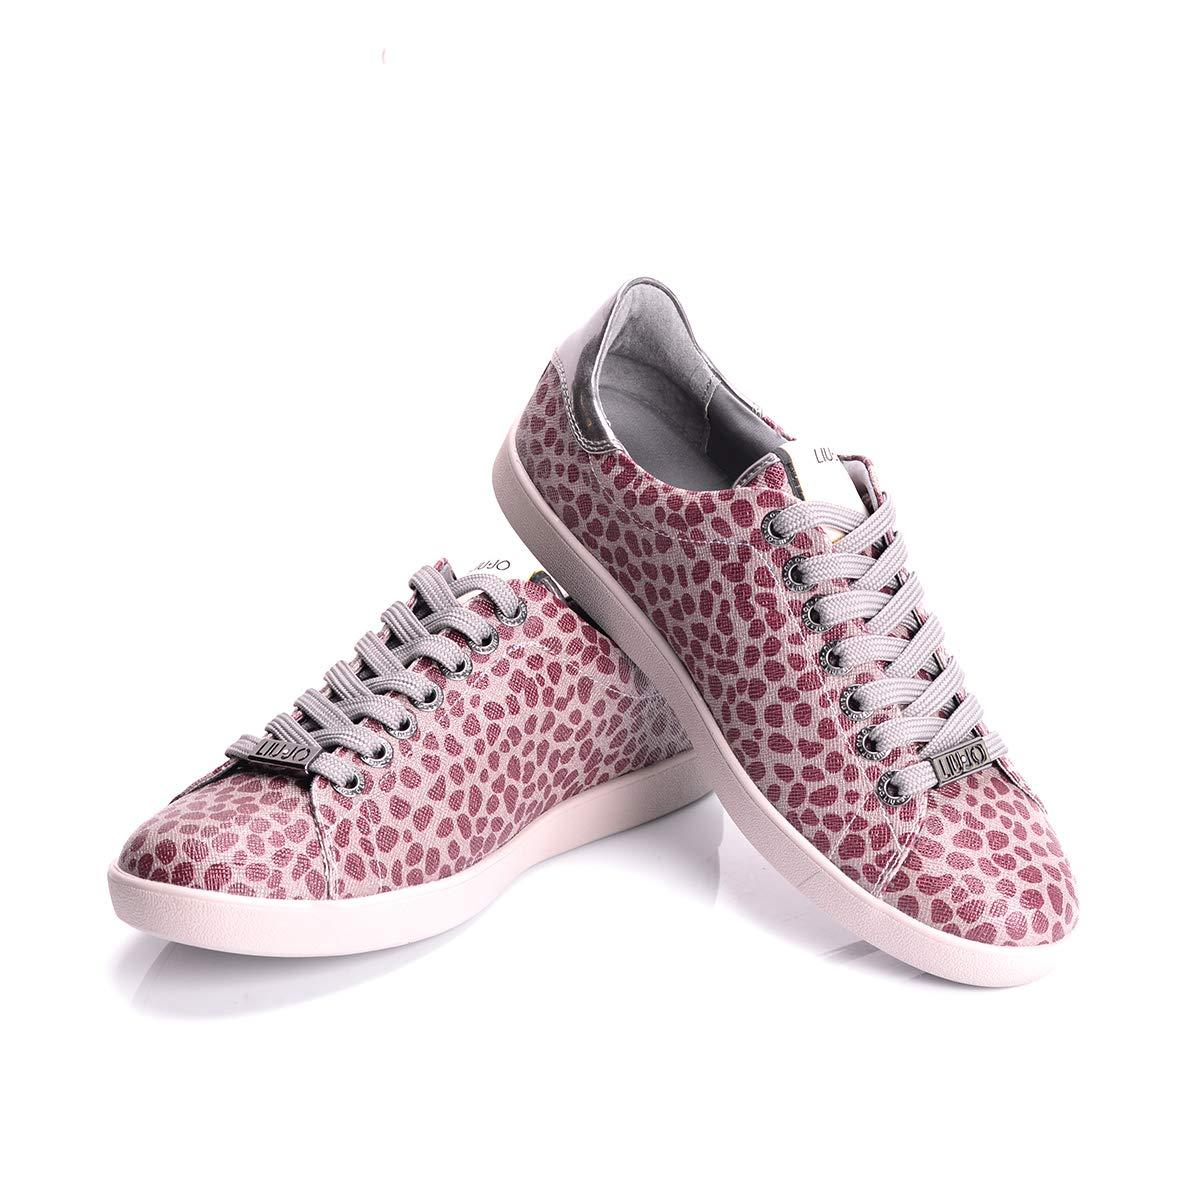 Liu-Jo Sneaker Celie - - Celie S65109 E0087 / Sneaker Bassa Celie - SIZE: 37(EU) - c87774